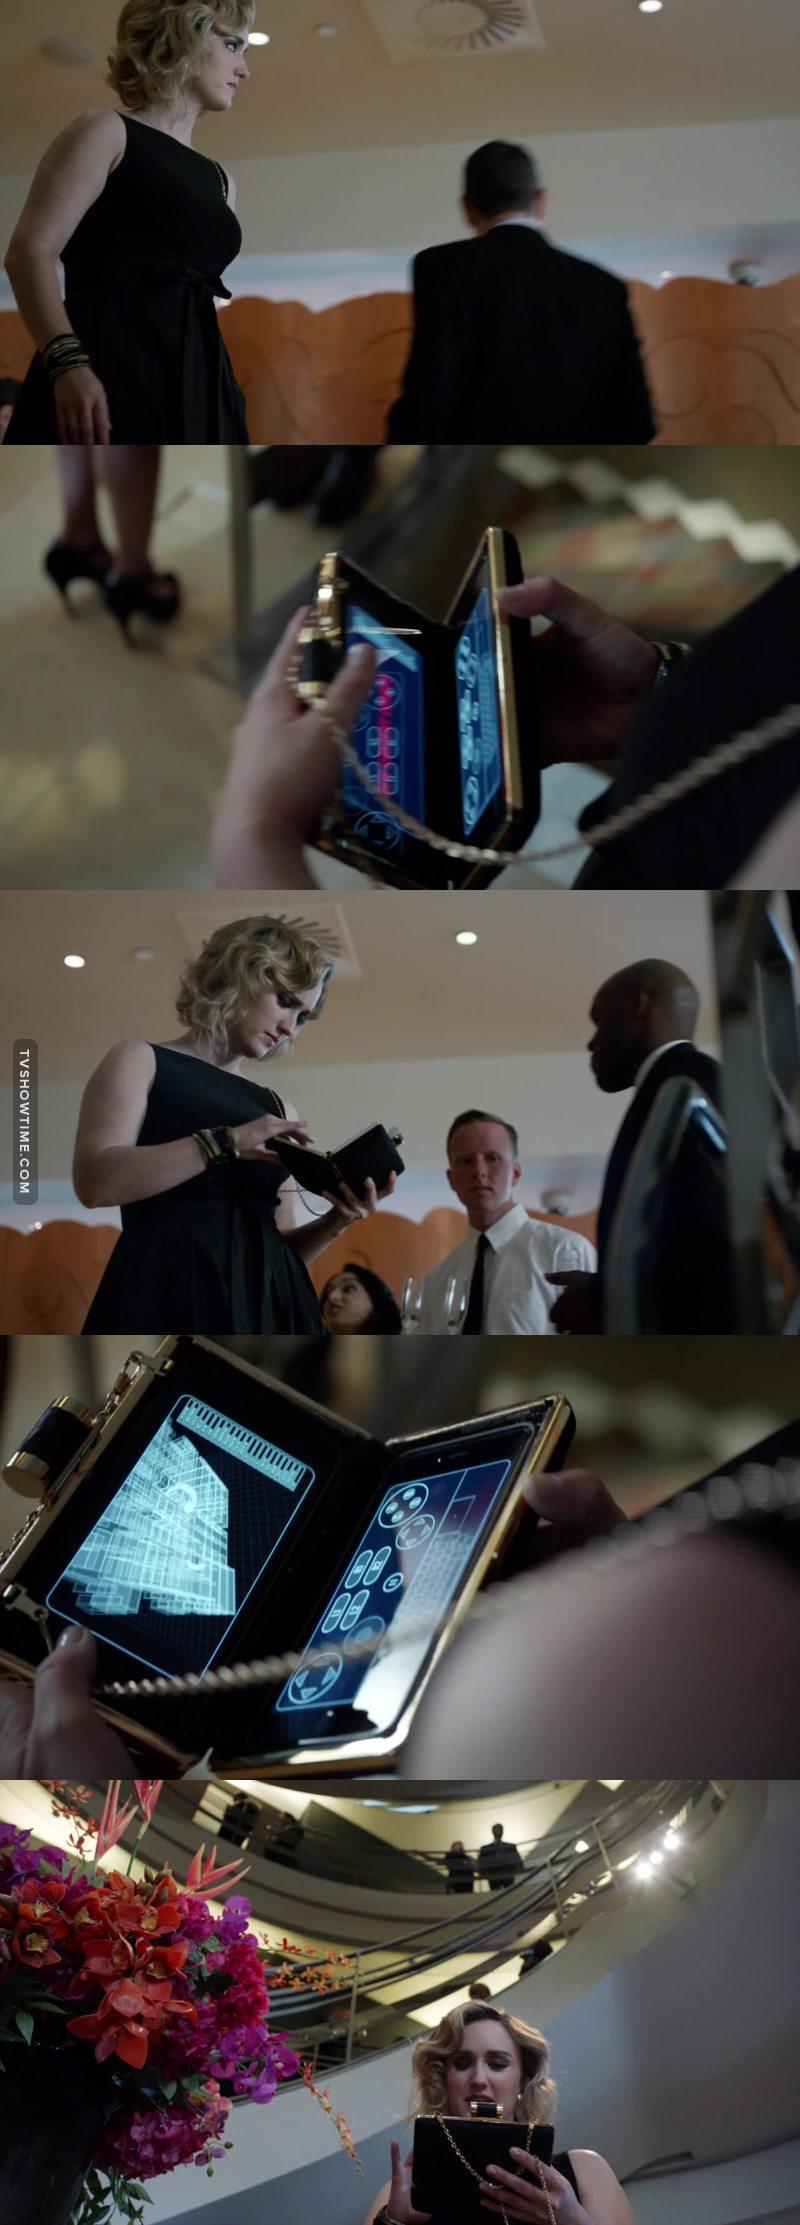 Patterson >>> Inspector Gadget.